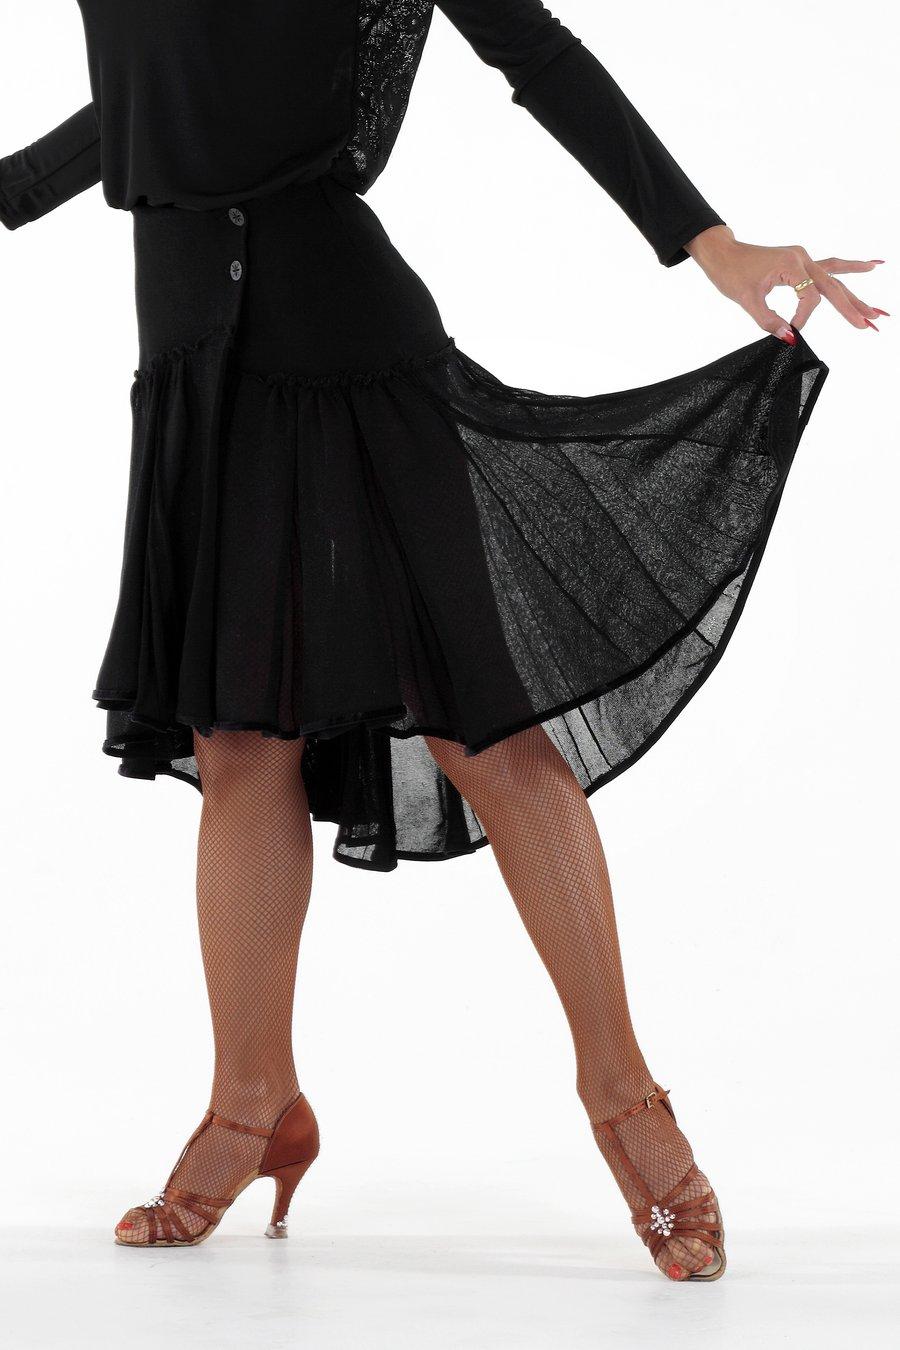 Image of Luxurious Knitted Circular Skirt JNS-101 Dancewear latin ballroom